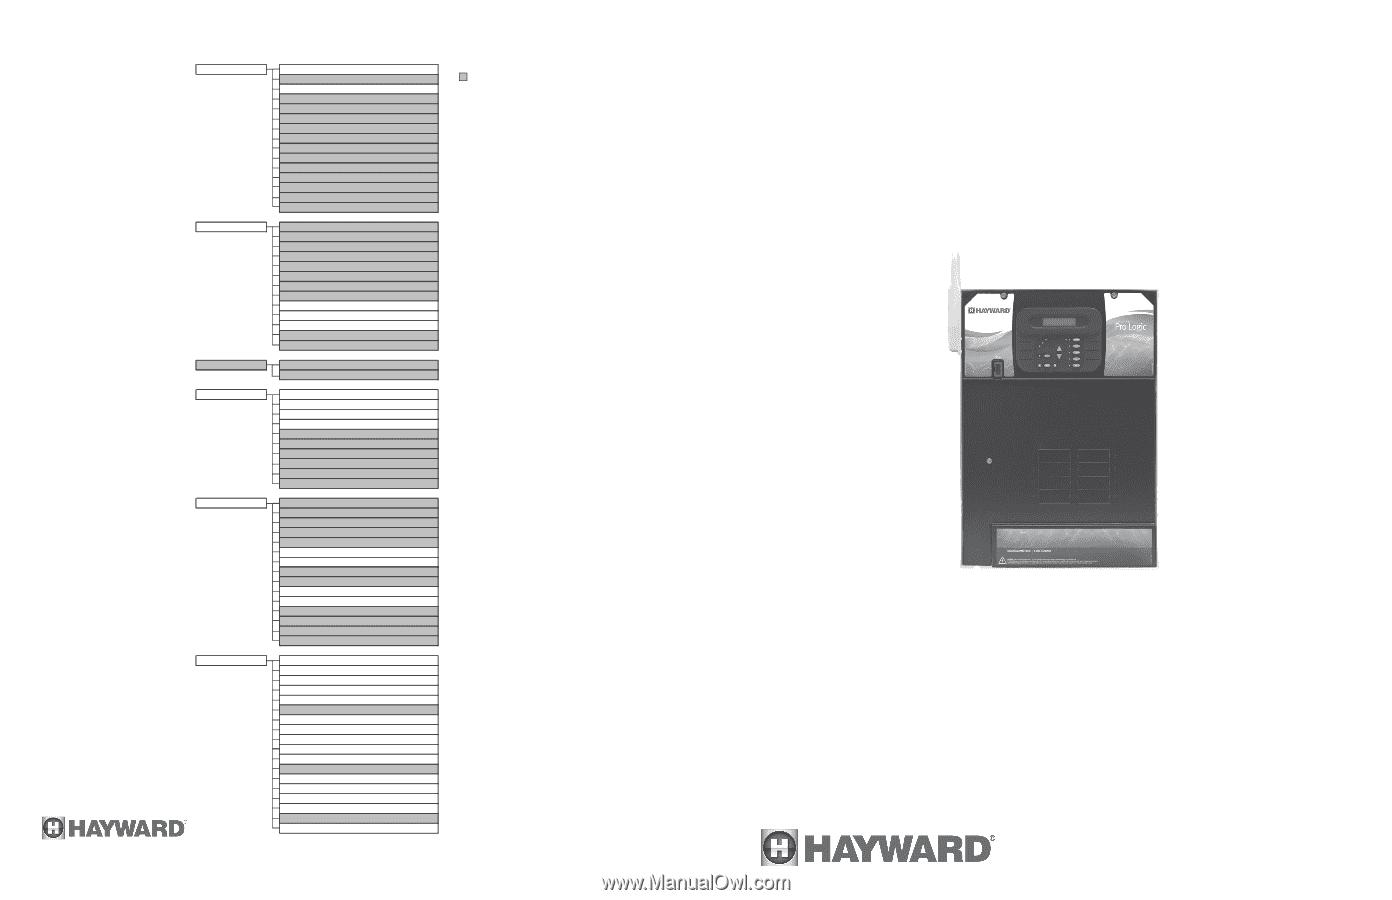 Hayward Aqua Plus Controls Plus Chlorination Model Pl